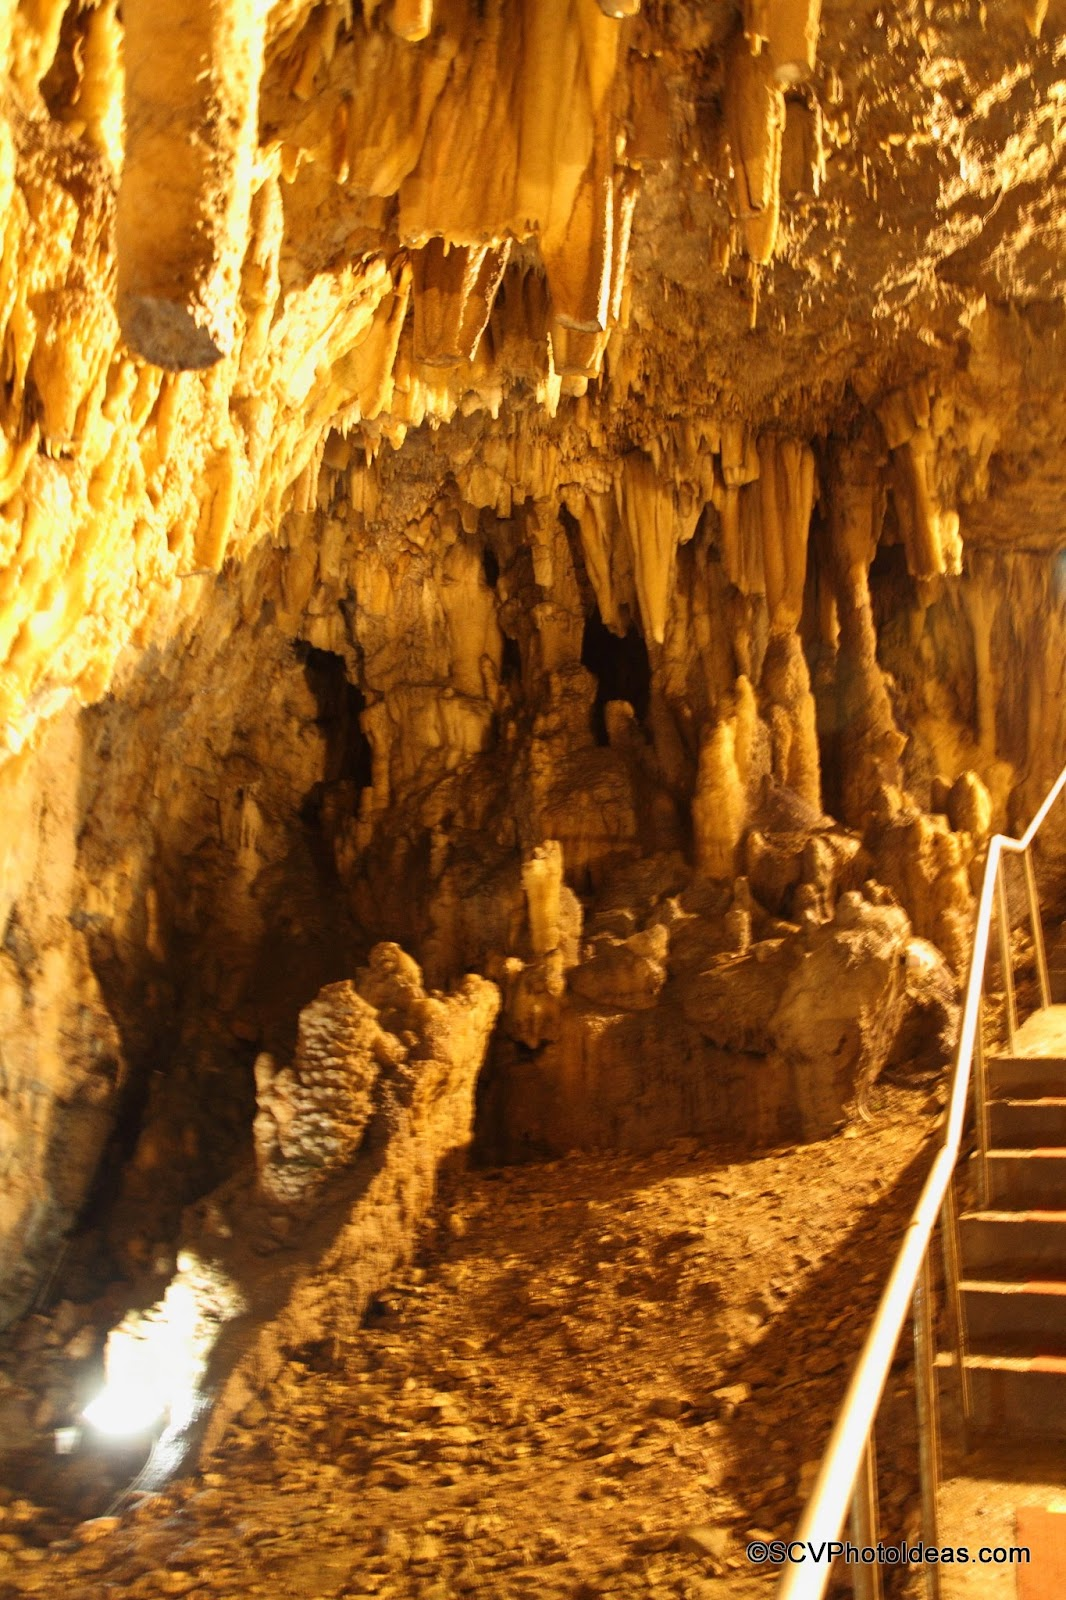 Drogarati Cave main chamber stalactite and stalagmite formations